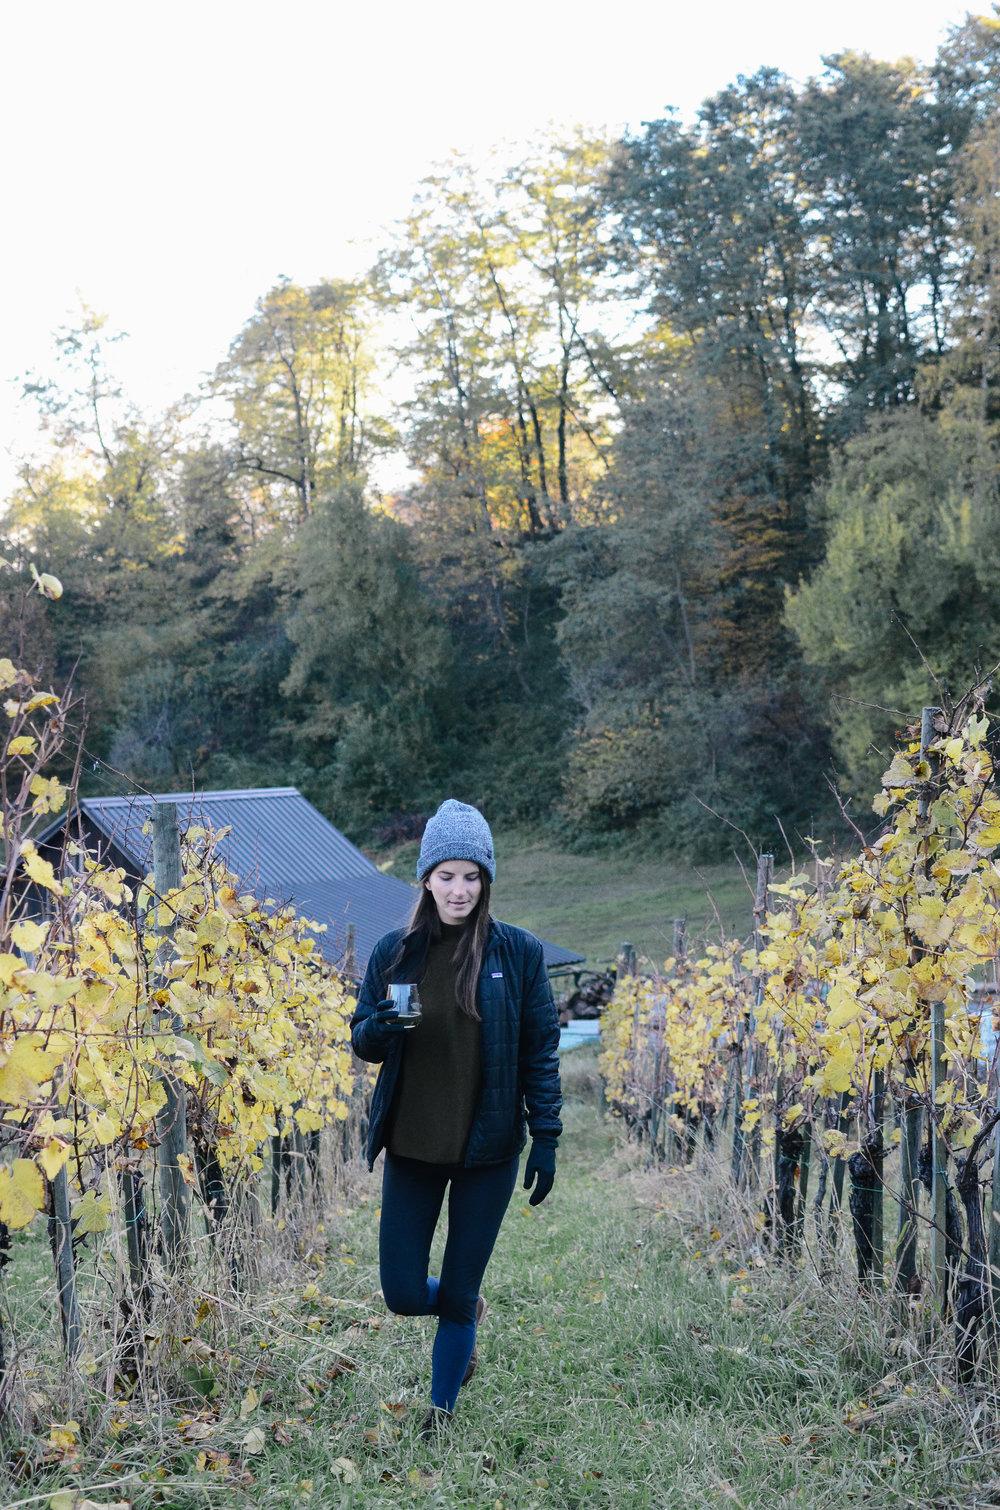 slovenia-travel-glamping-chateau-ramsak_DSC_2184.jpg